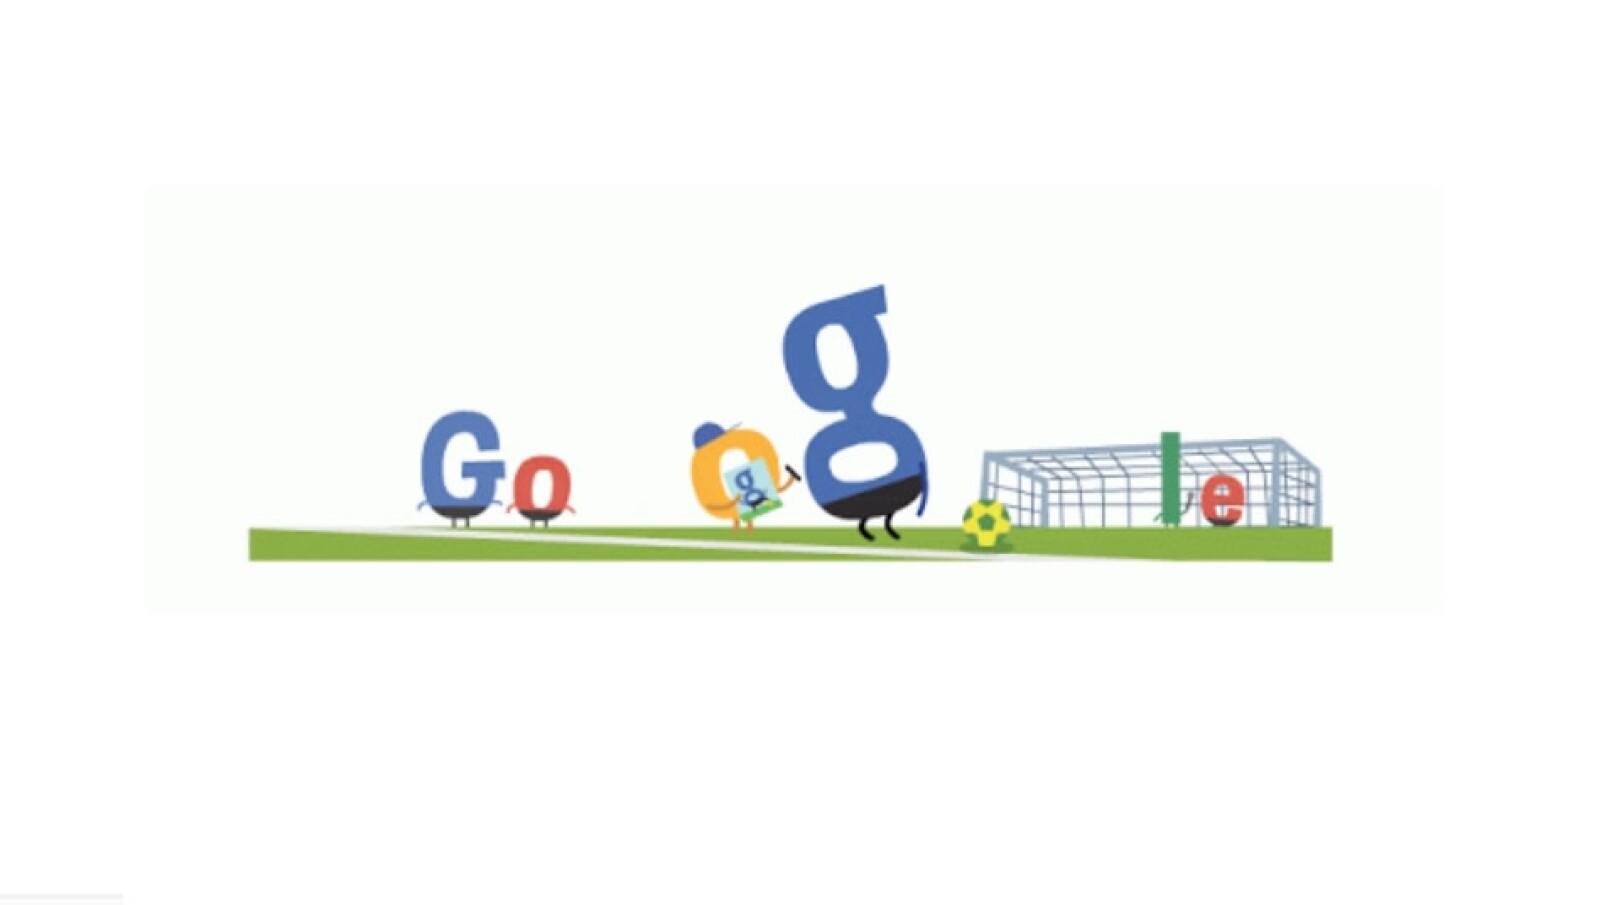 Google doodle 45